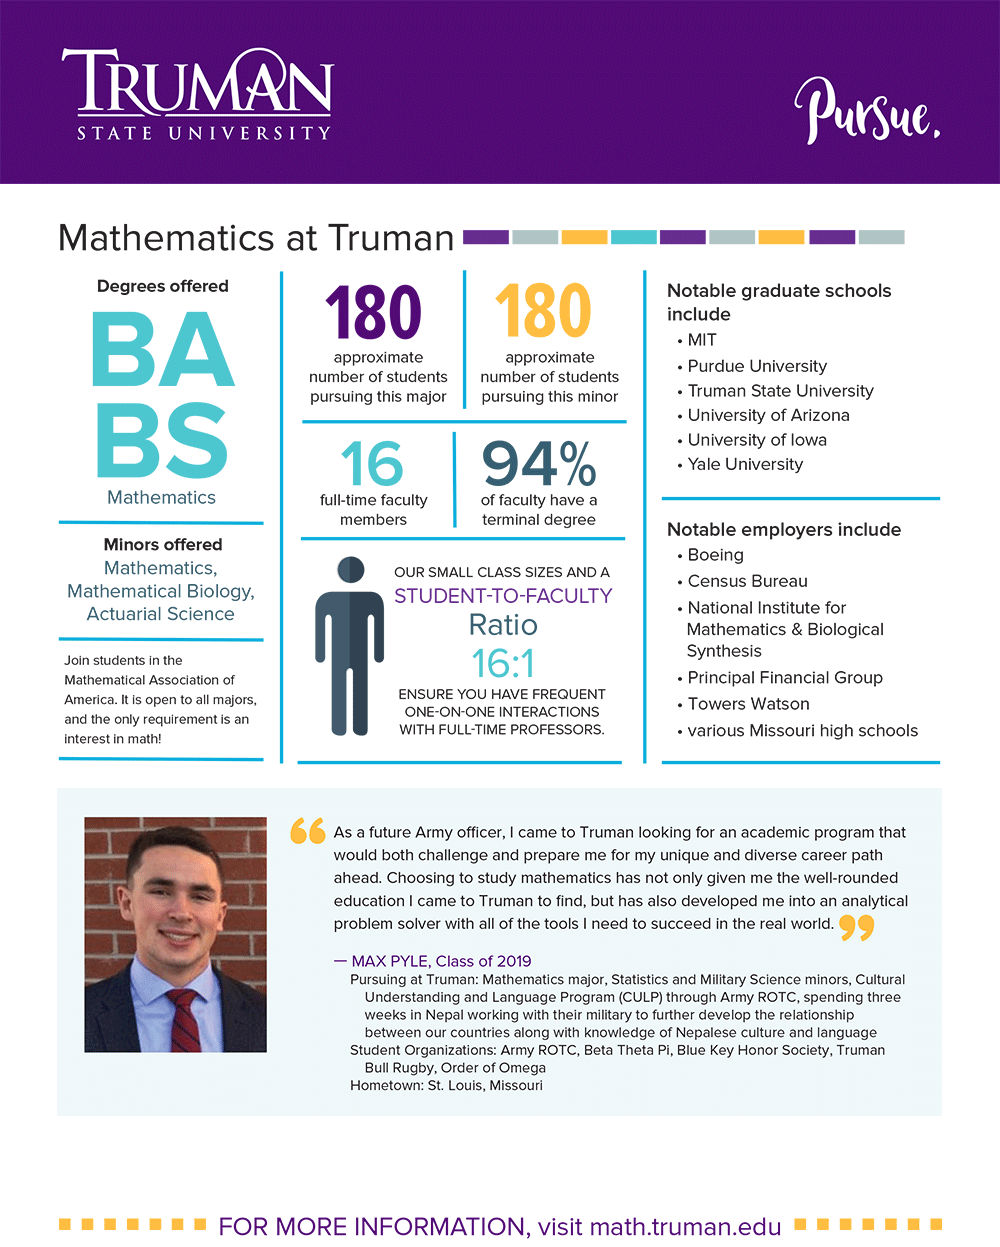 Mathematics Quick Facts